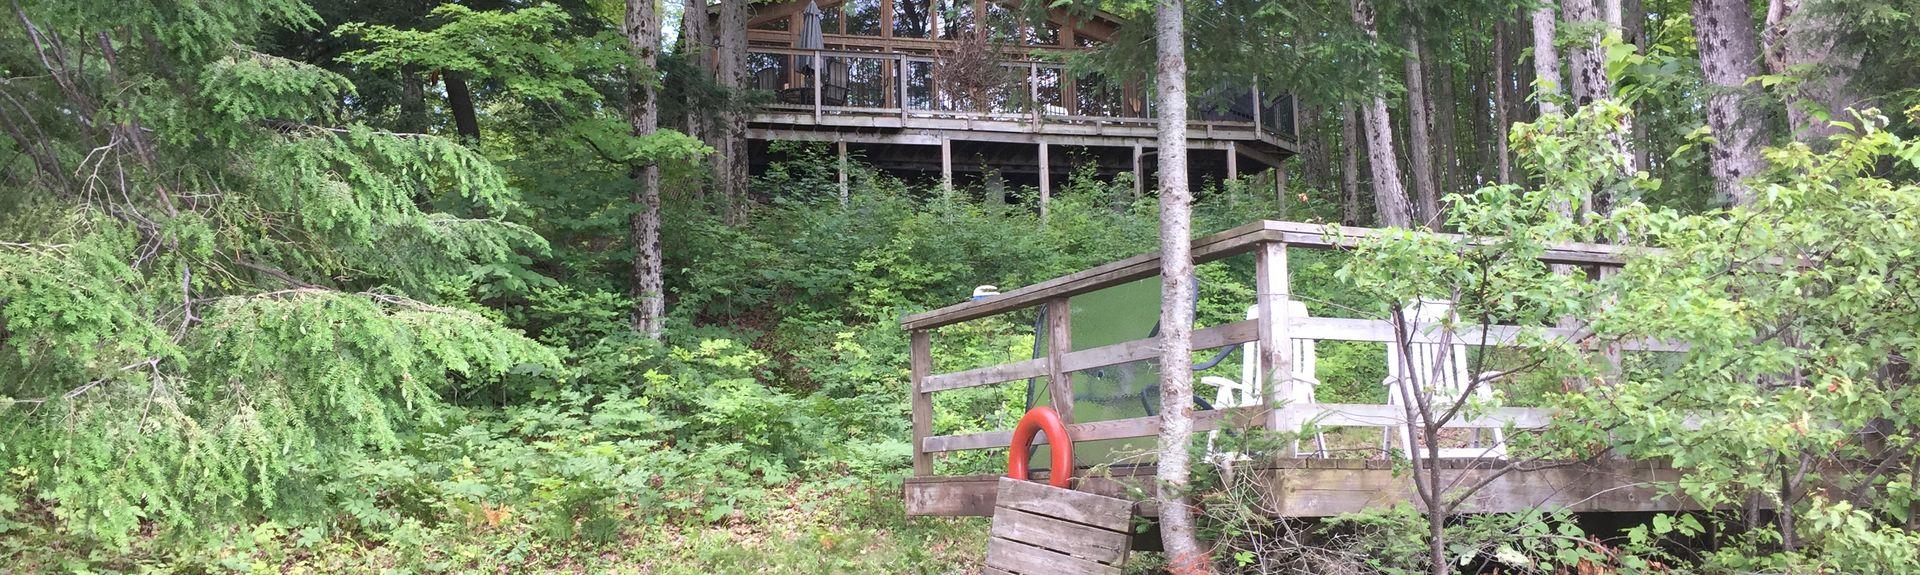 Rideau Lakes, Westport, ON, Canada